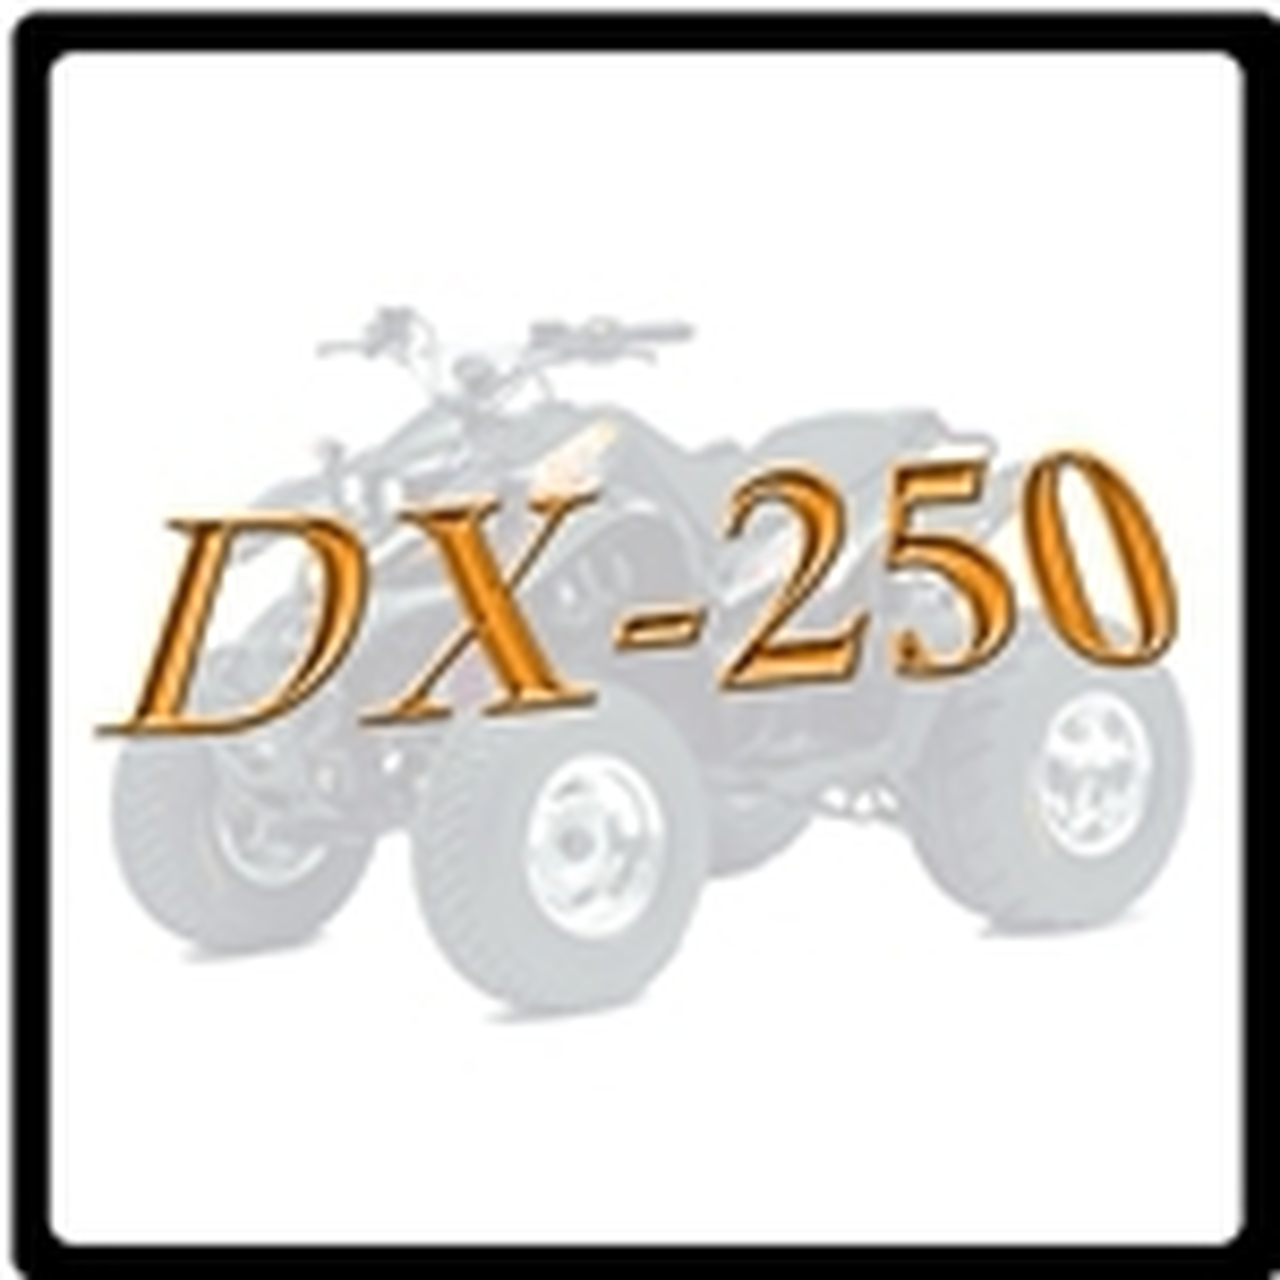 DX-250